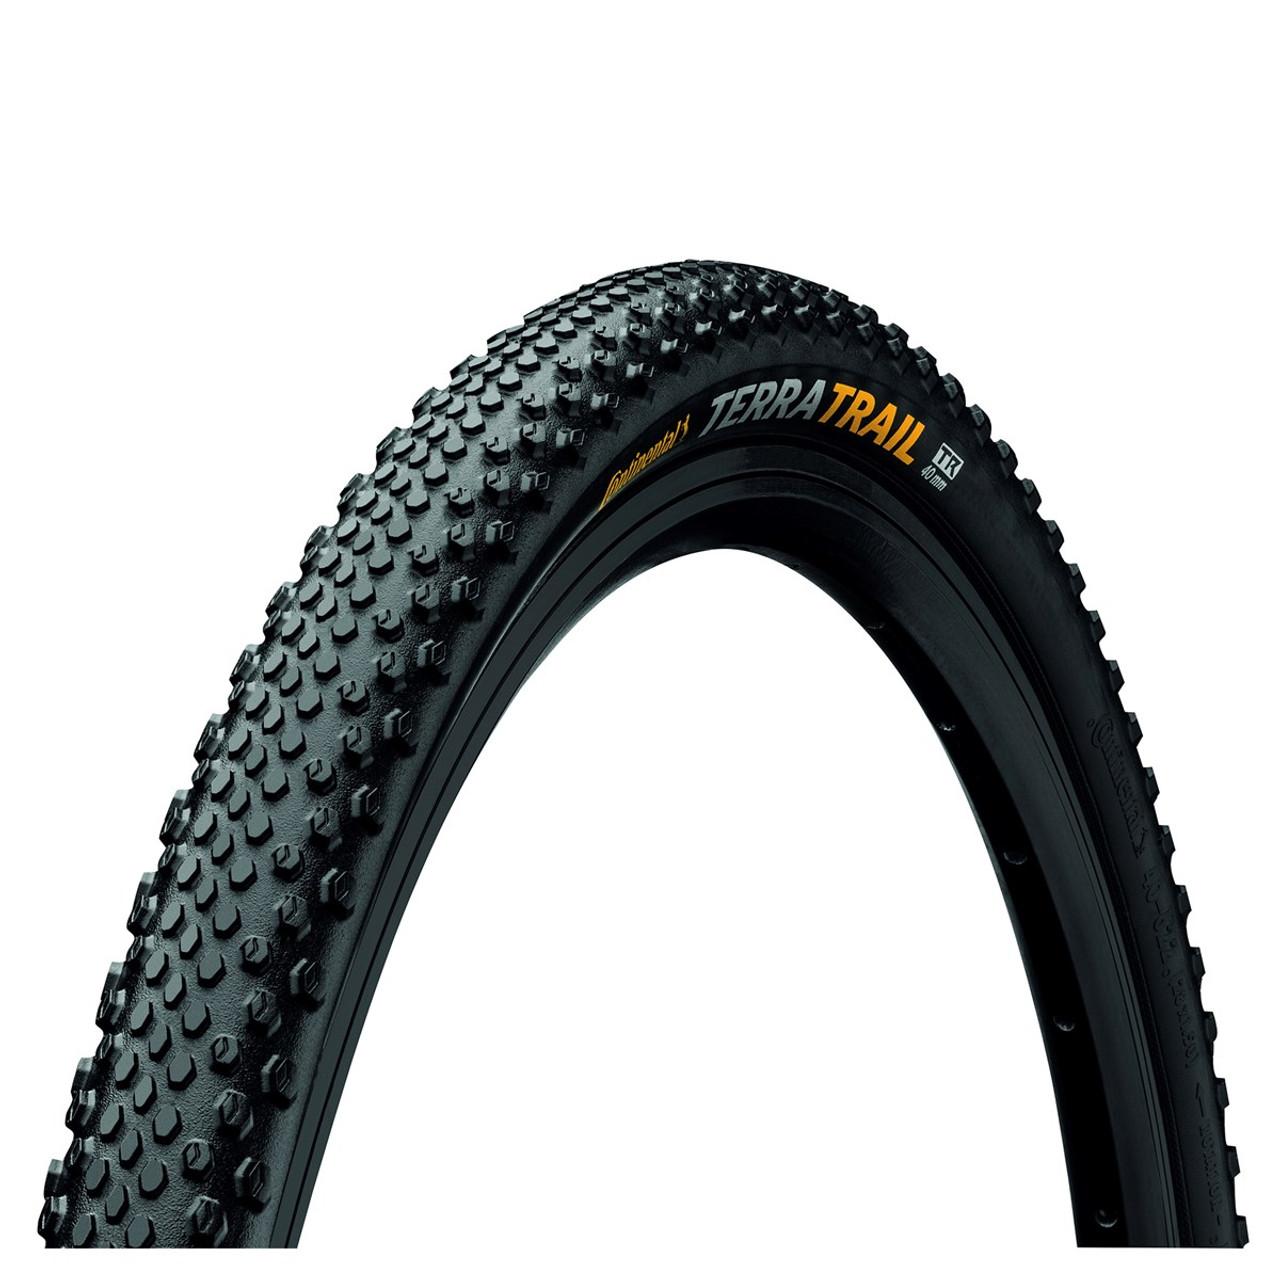 Continental Terra Trail Protection BlackChili Folding Gravel Tubeless Tyre